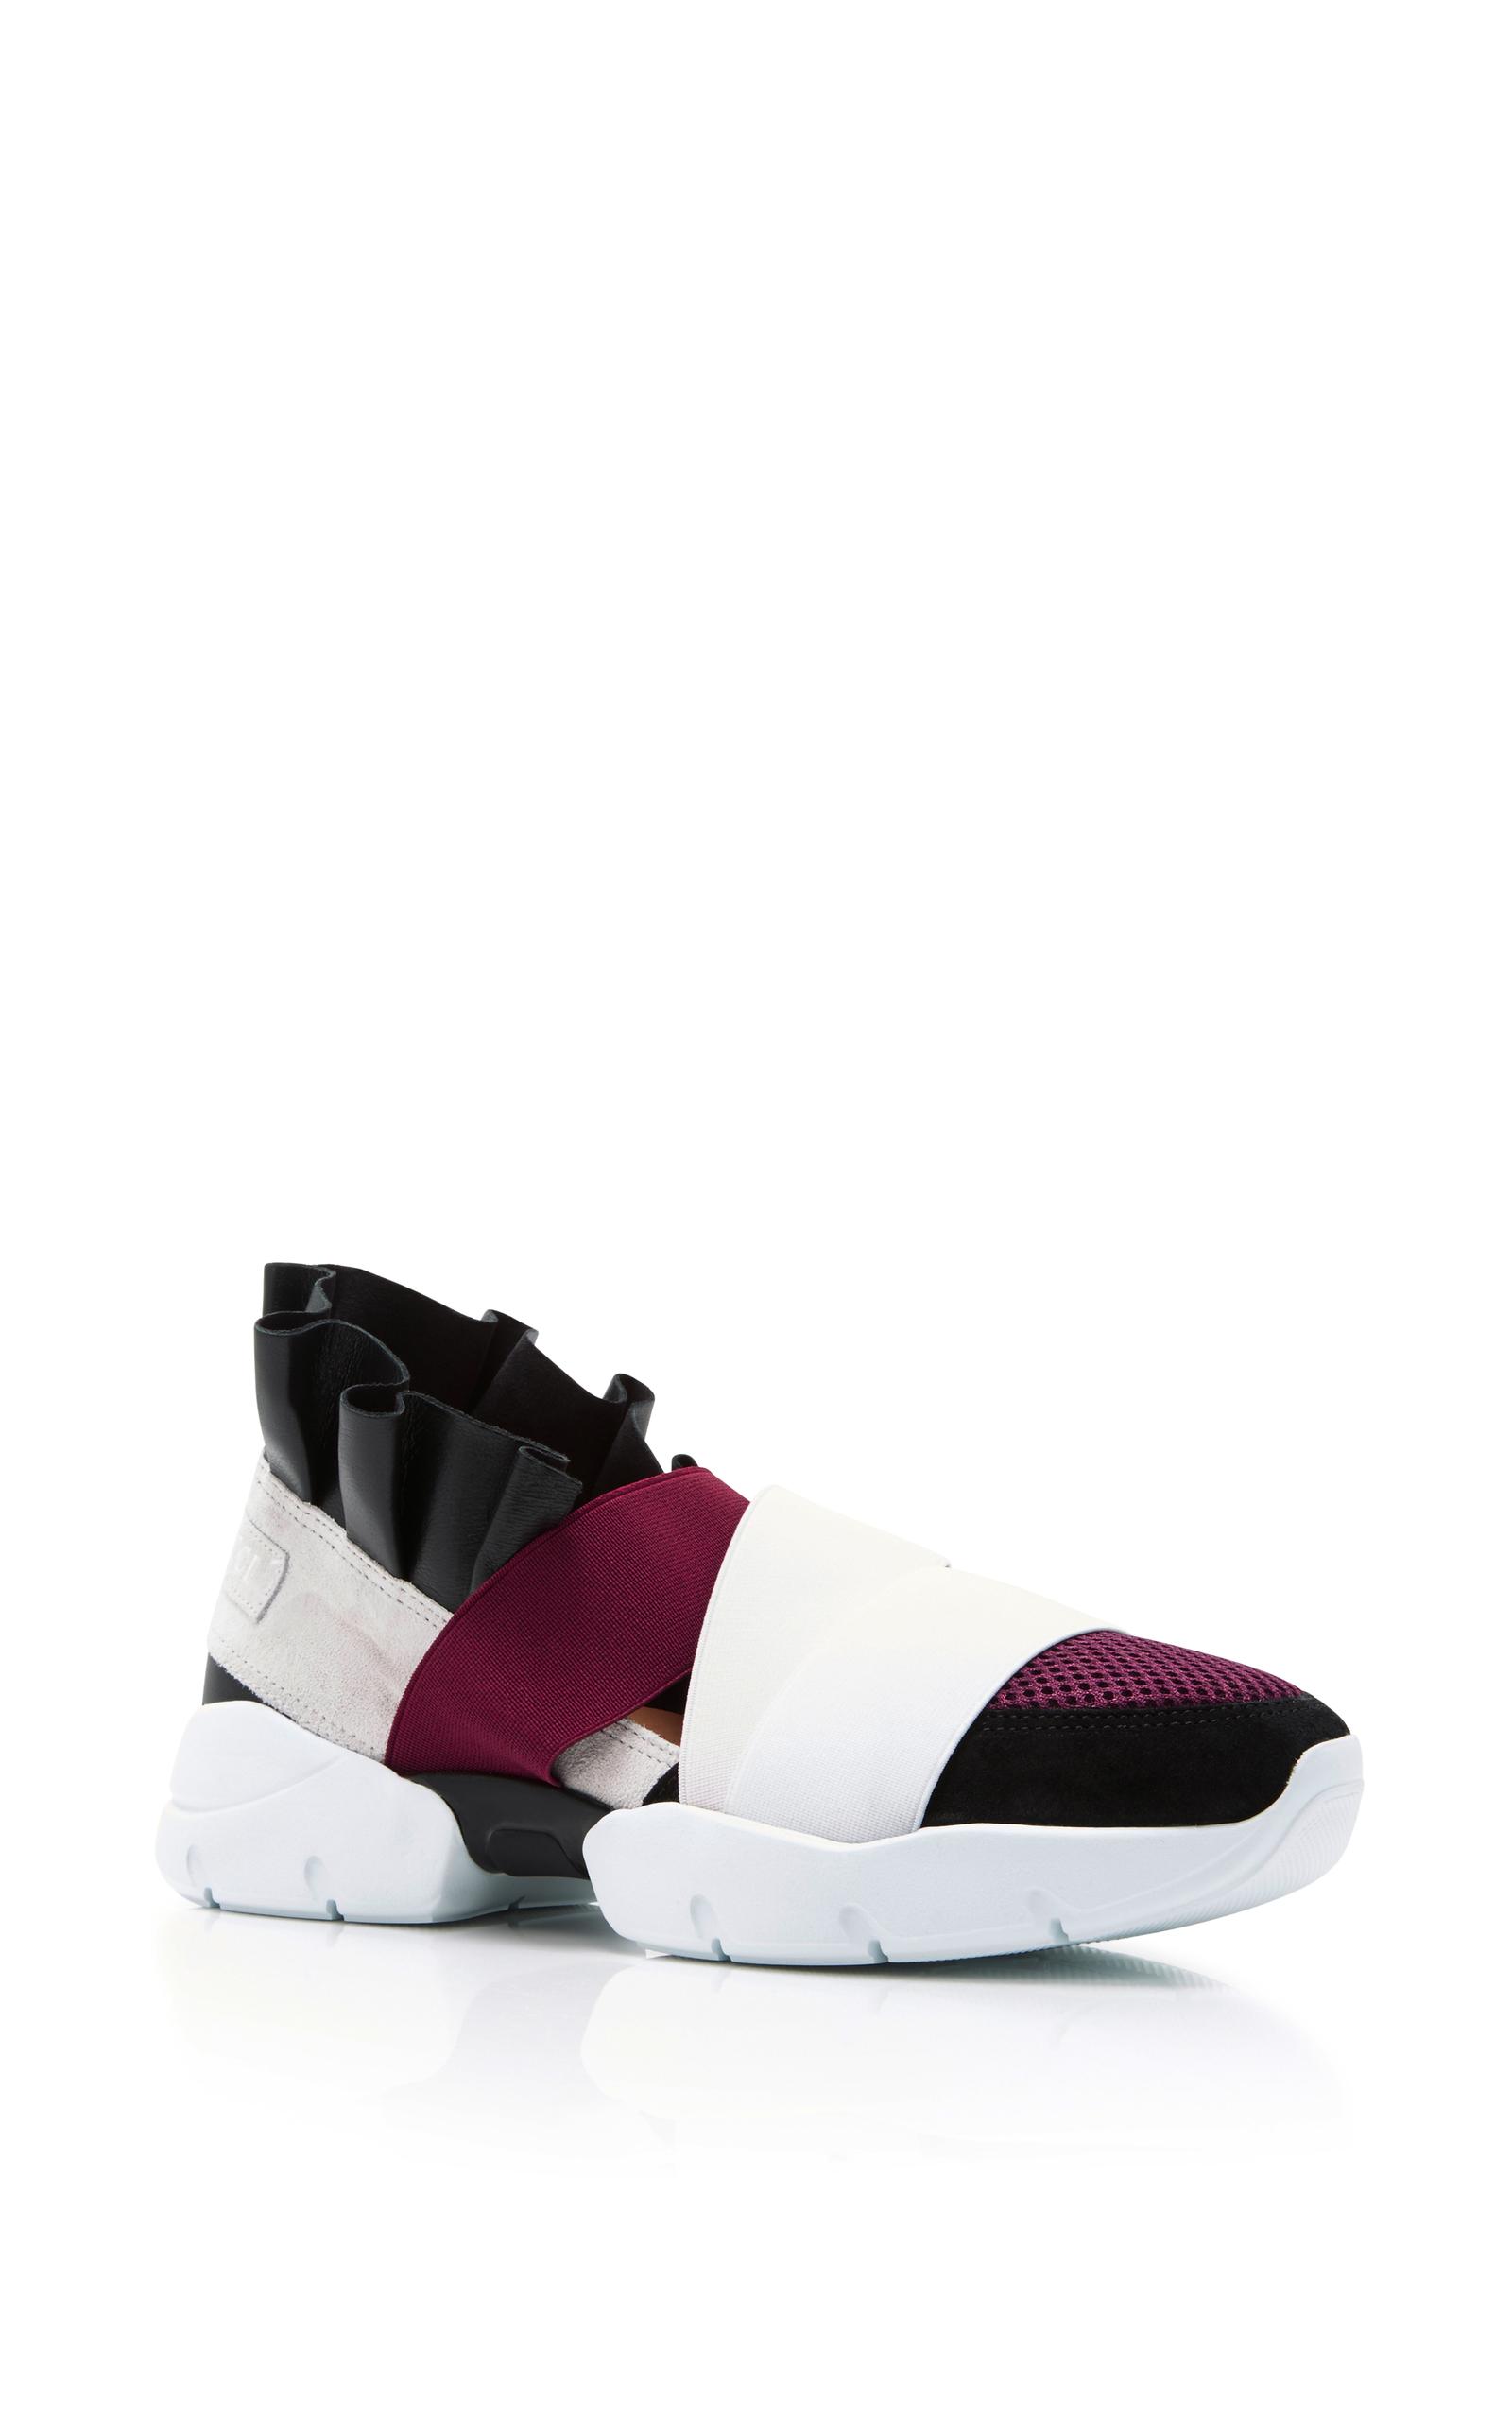 EMILIO PUCCI Black & Grey Colorblock Sneakers